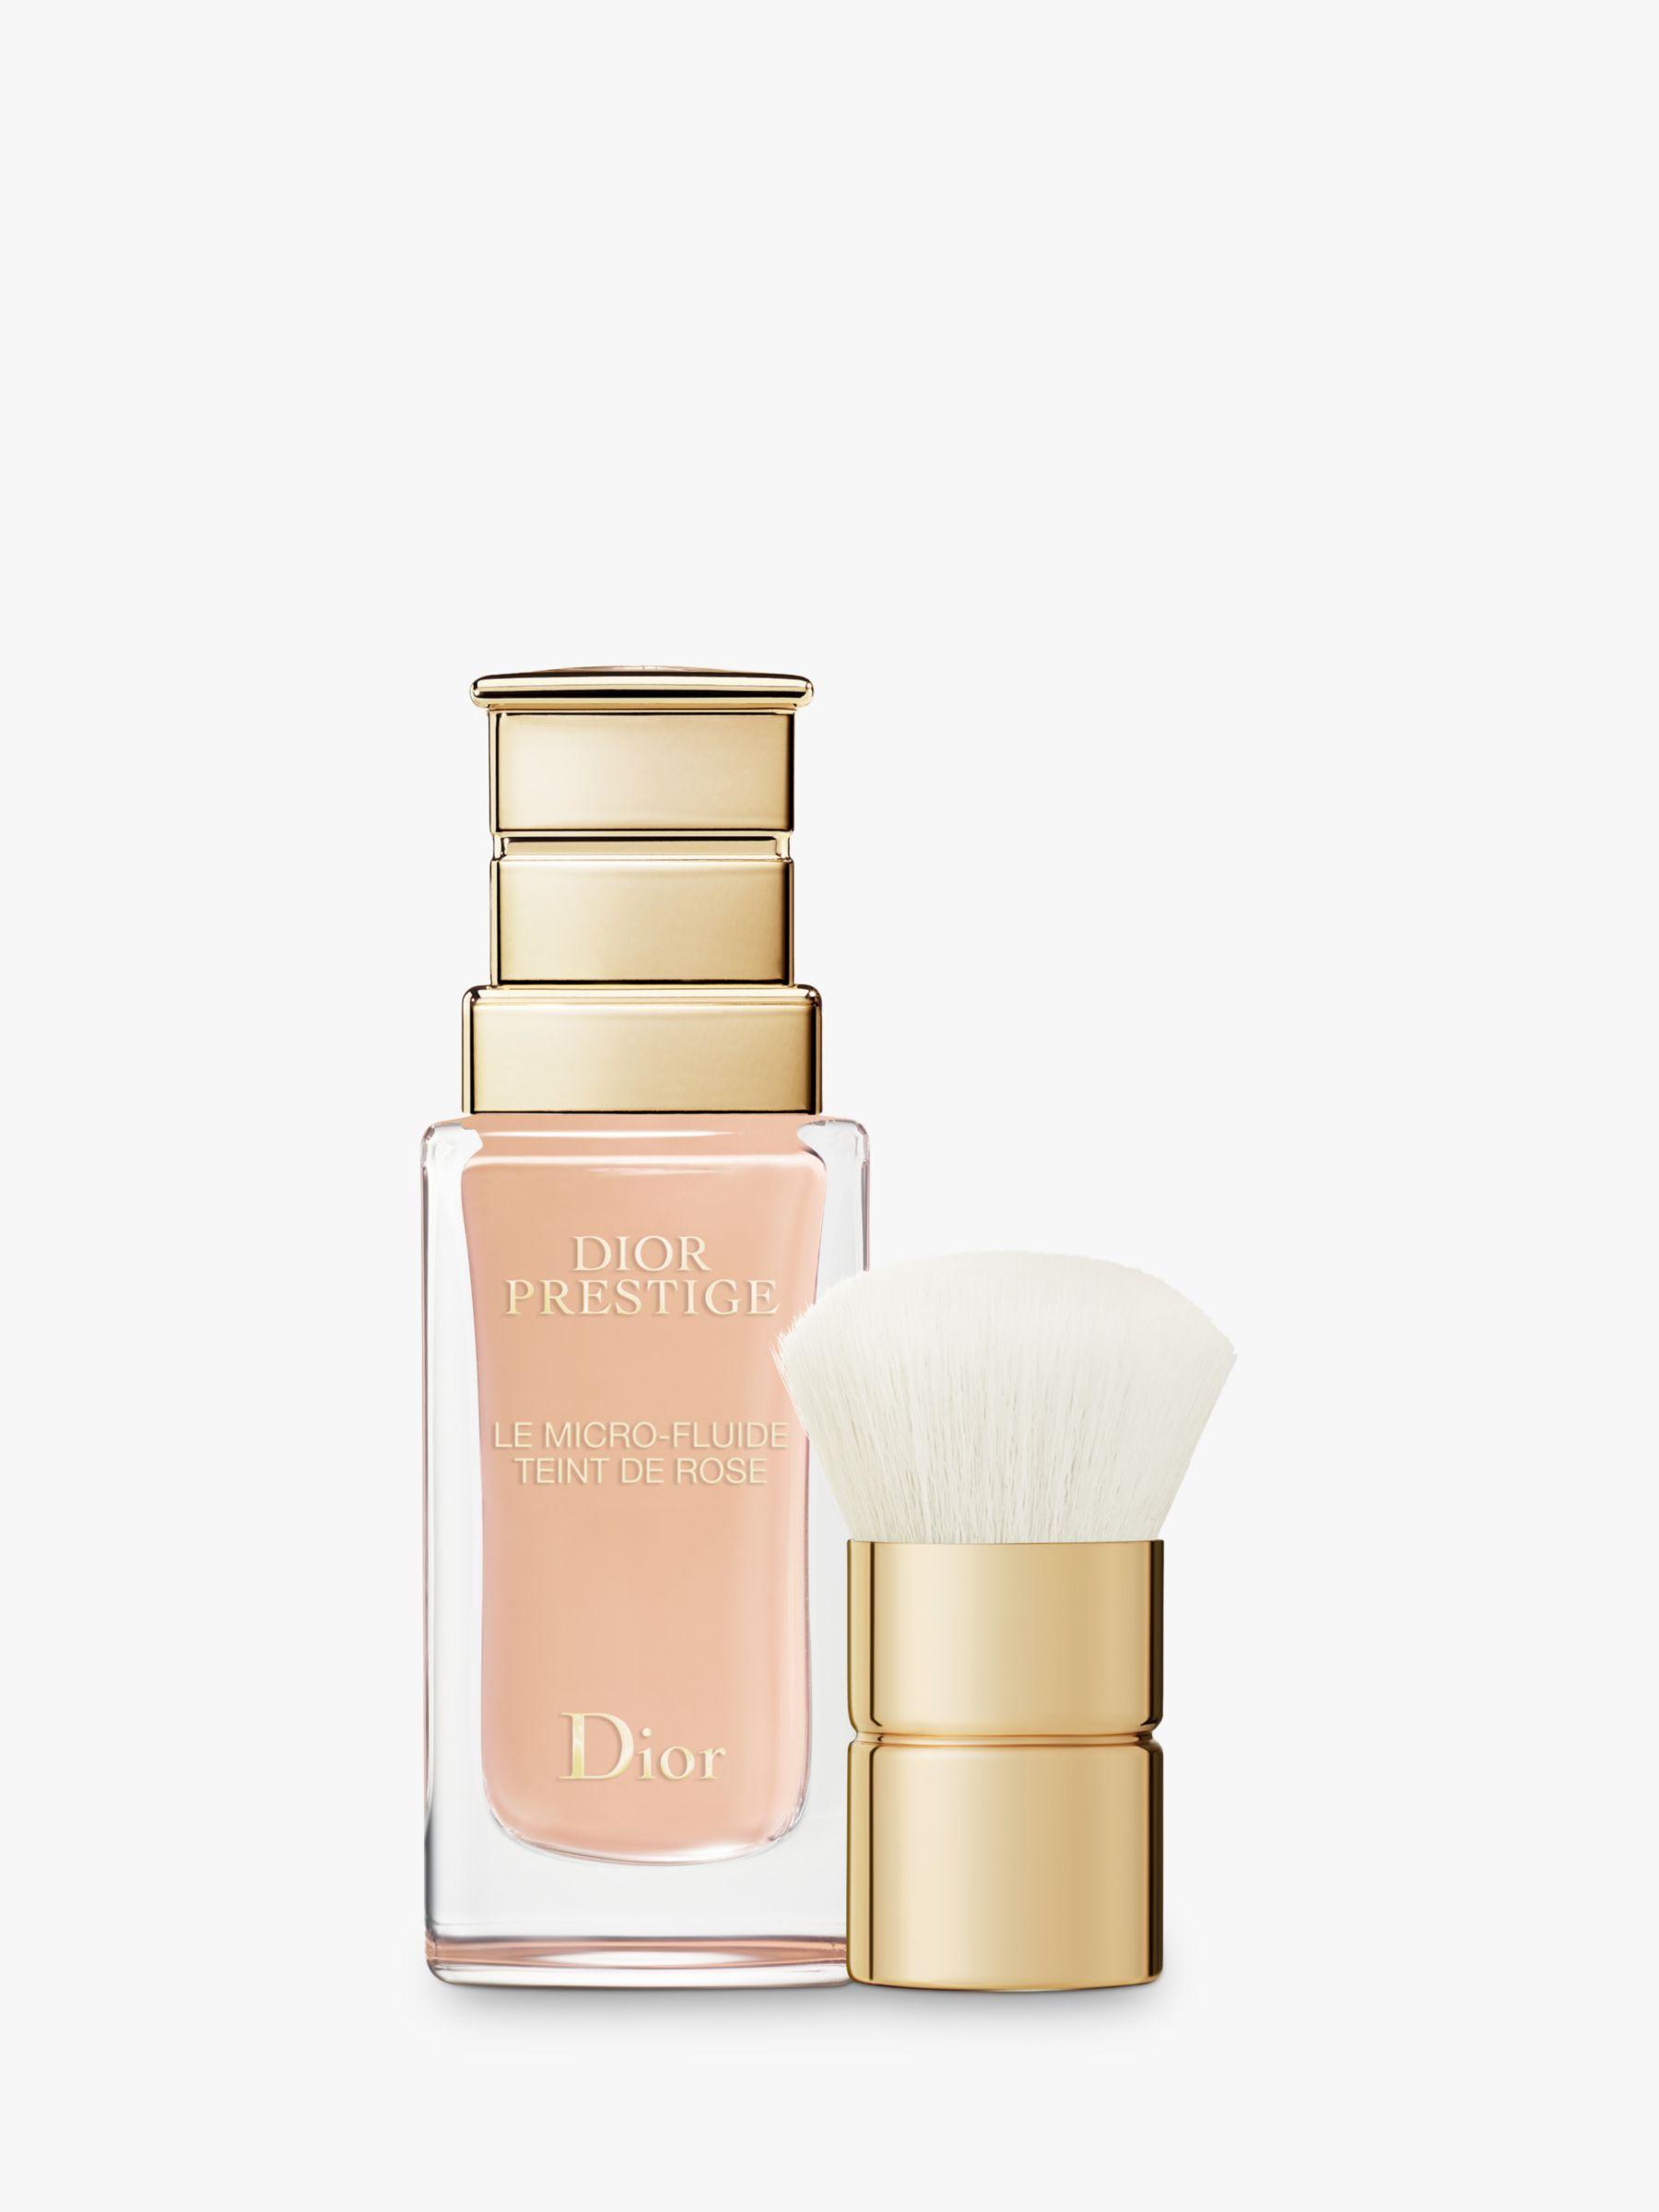 Dior Prestige Le Micro Fluide Teint De Rose Foundation Spf